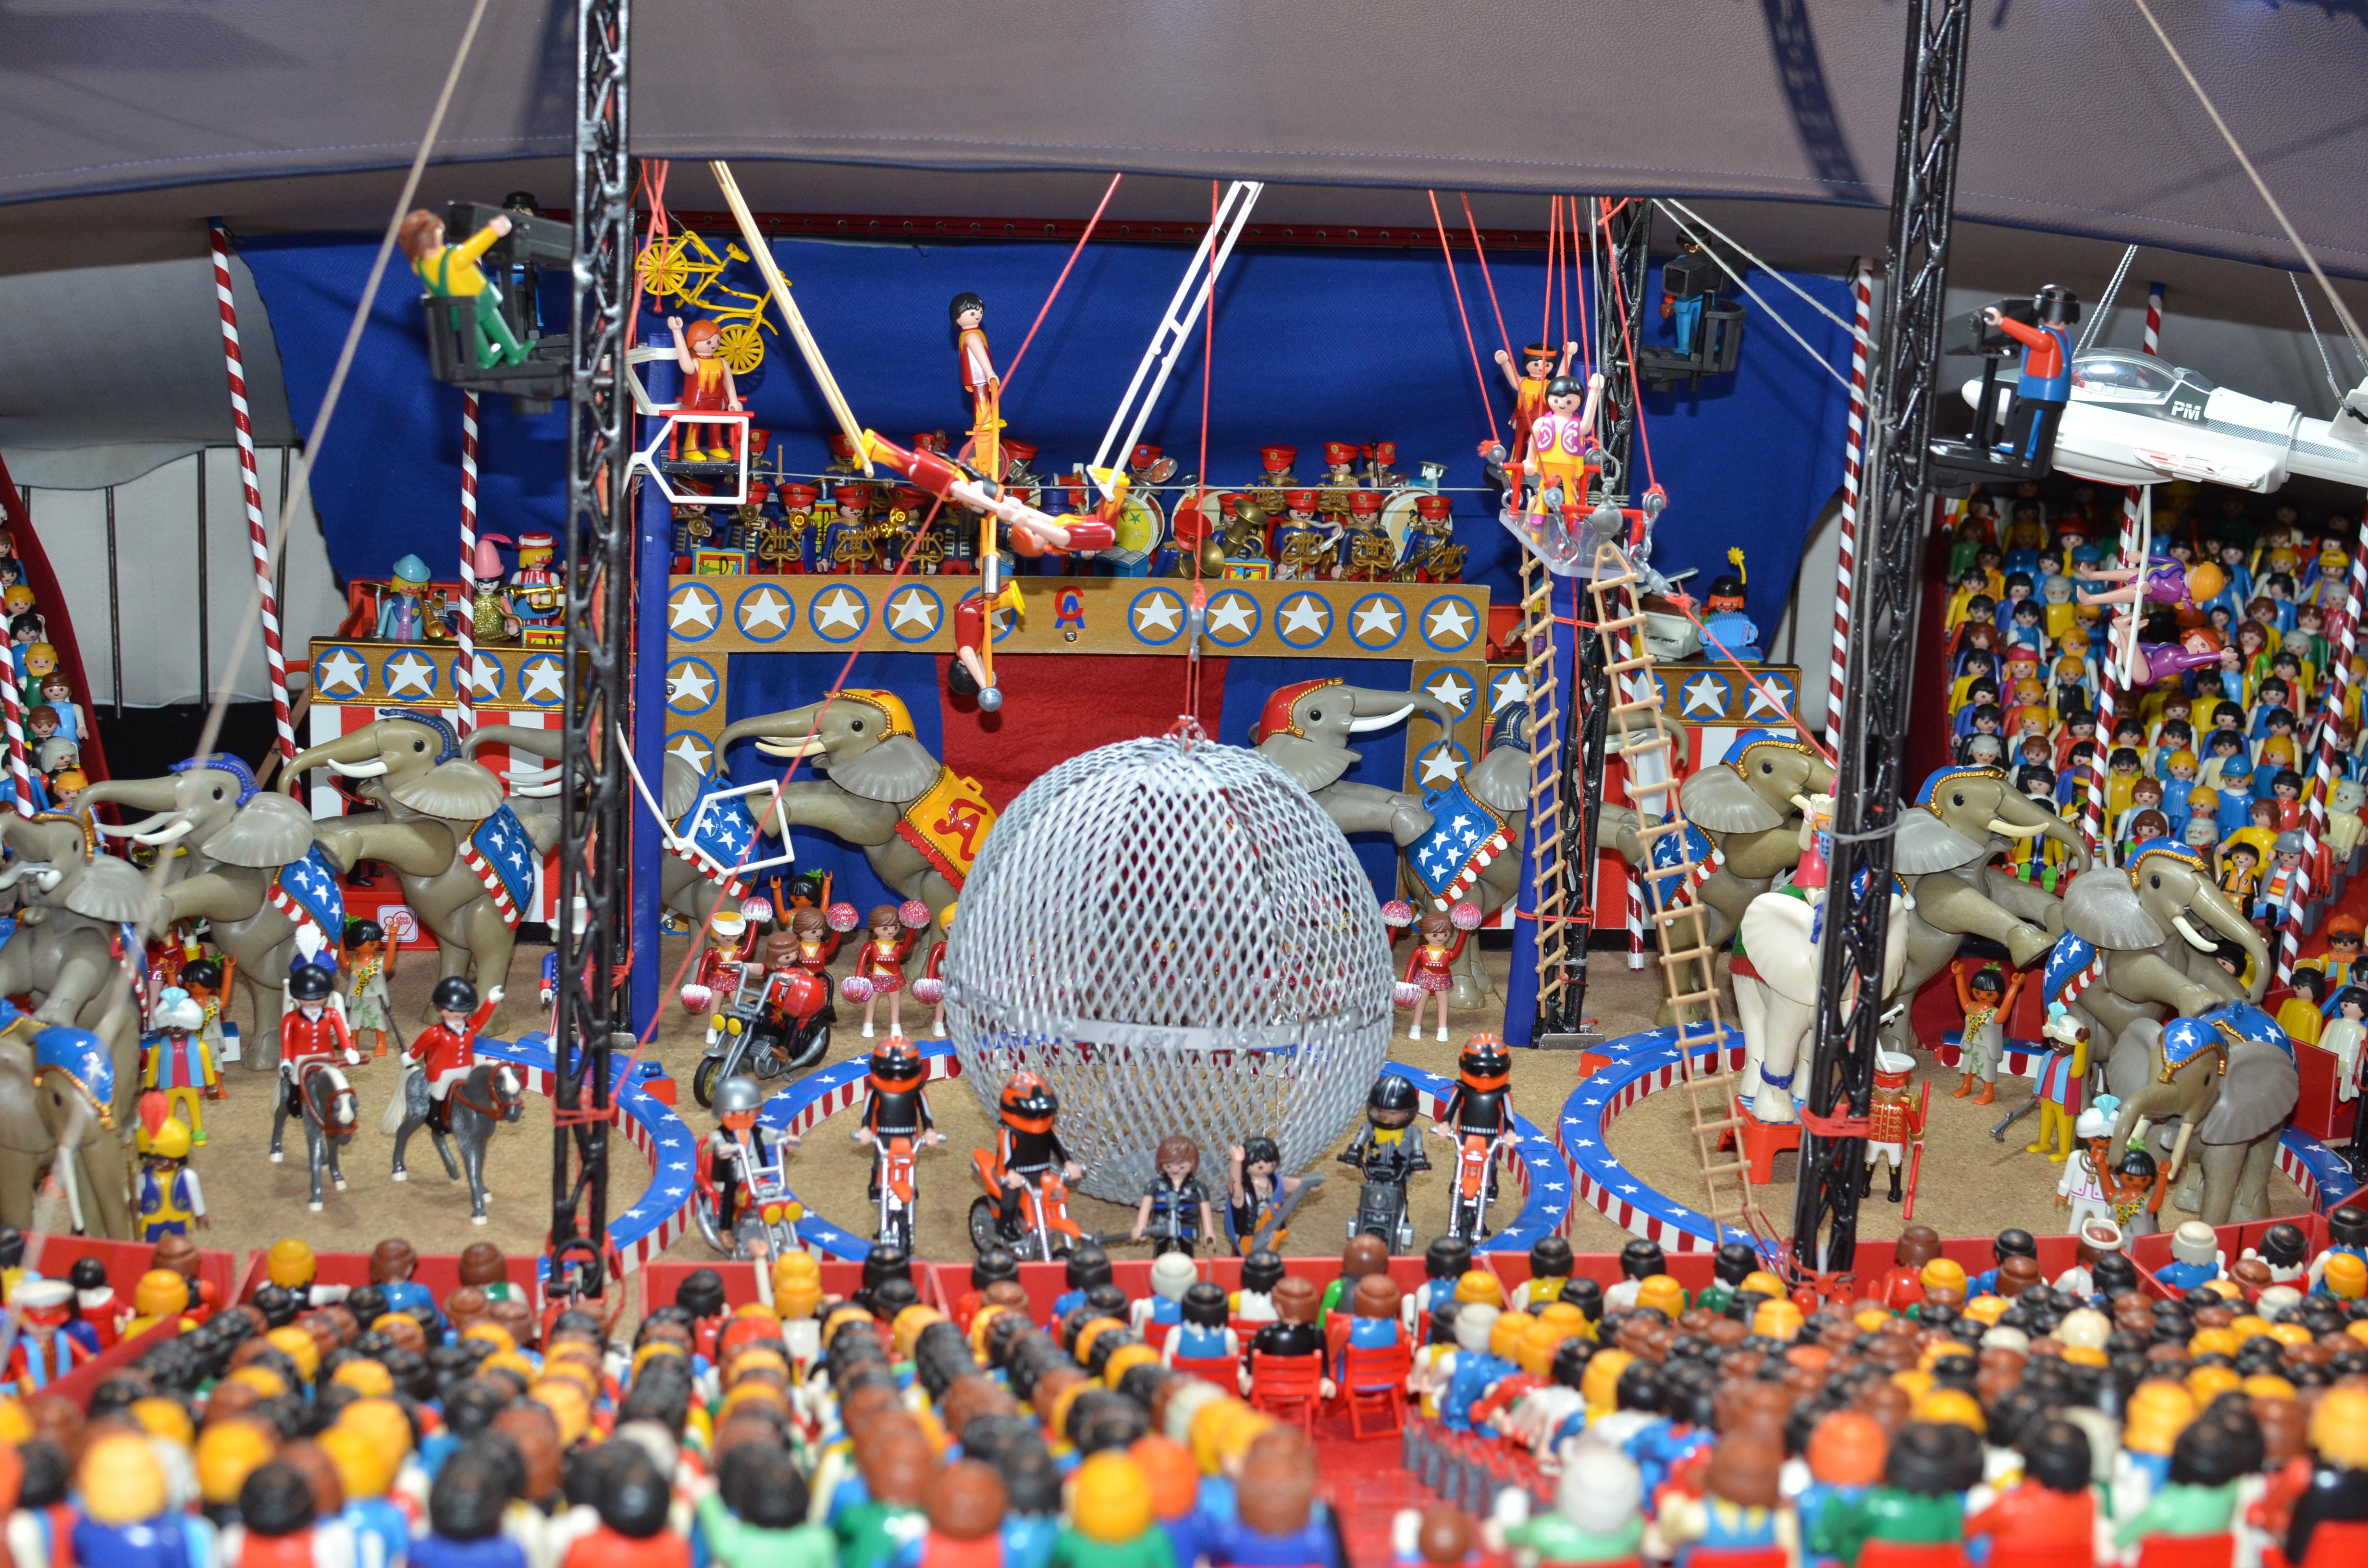 1200 figurines playmobil dans le cirque kids parc - Cirque playmobil ...